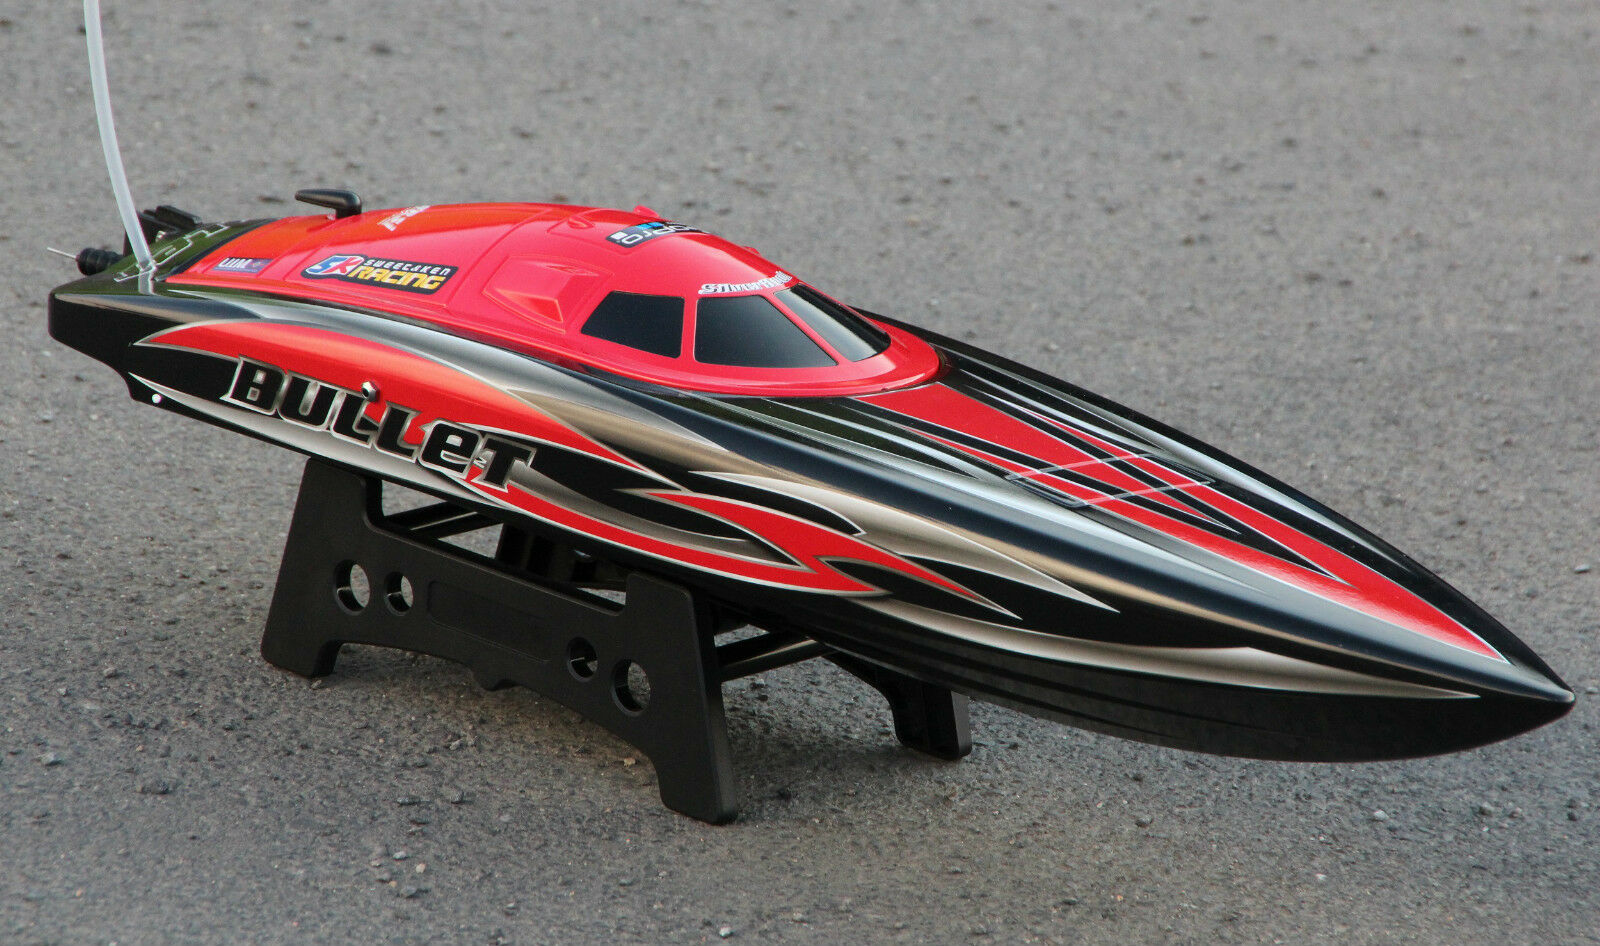 Joysway Rc Barco de Carrera Bullet V3 60+ 60+ 60+ km   H sin Escobillas V-Barco  ventas de salida